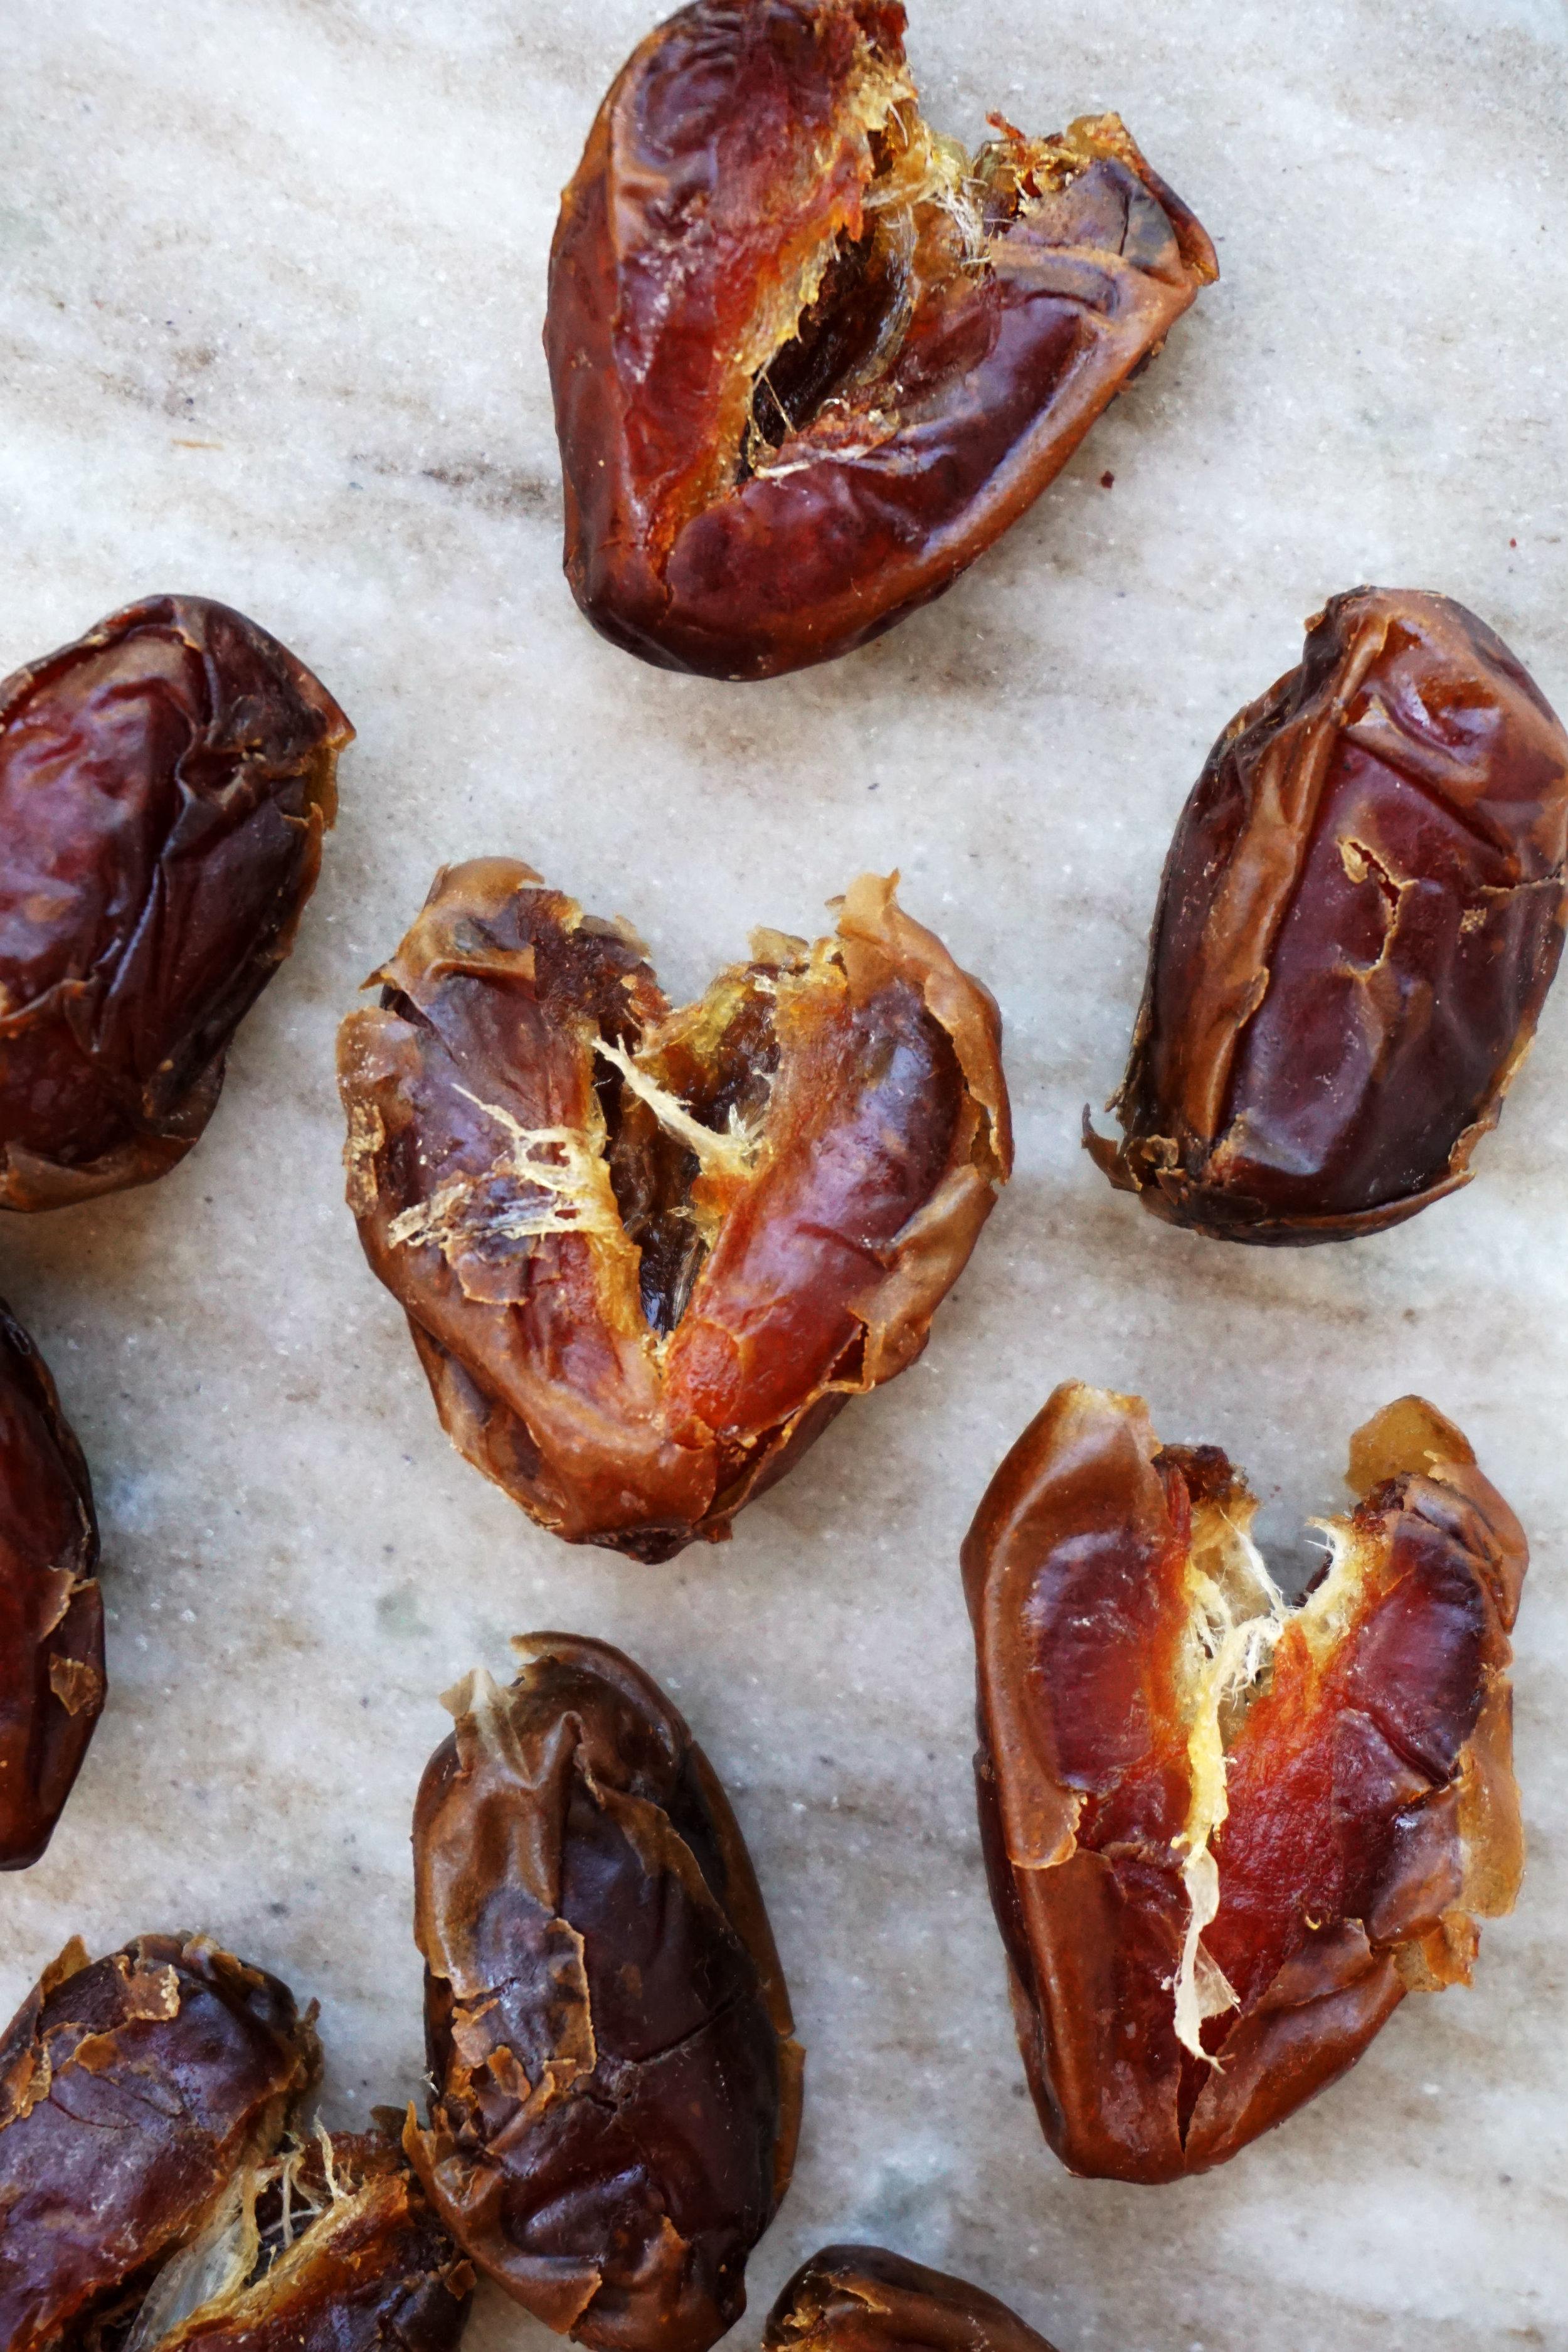 Chocolate-Dipped Date Bombs (Vegan, GF, Paleo)